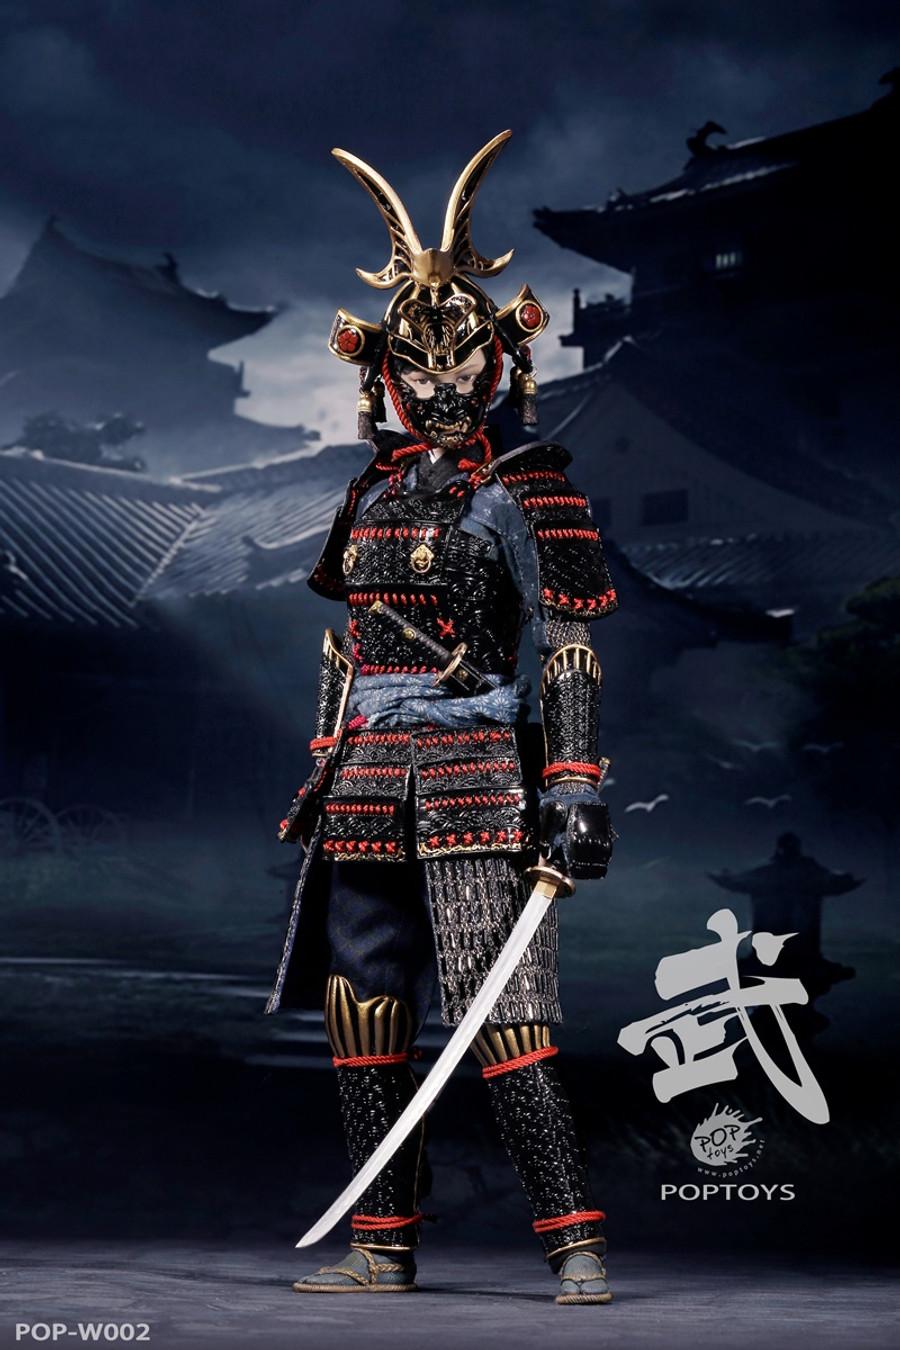 POP Toys - Warrior Women Series: The Butterfly Helmets Female Warriors (Black Armor Luxury Version)